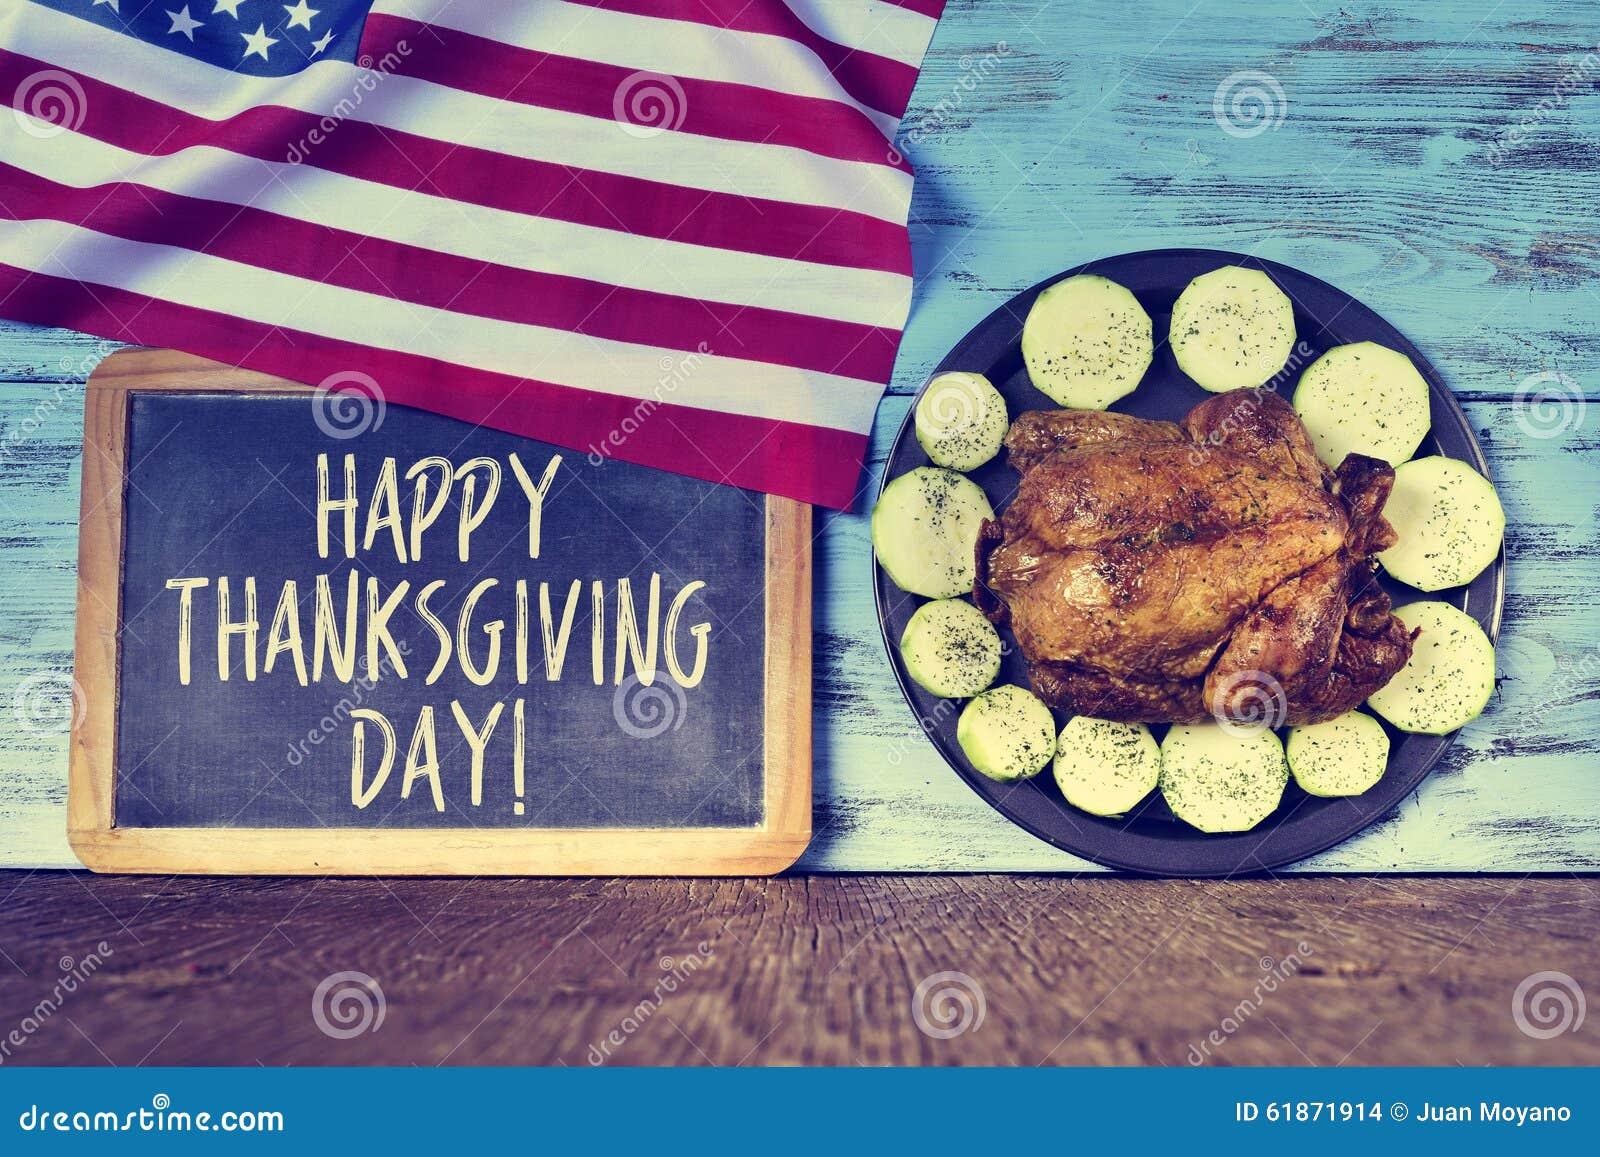 states thanksgiving day - photo #19